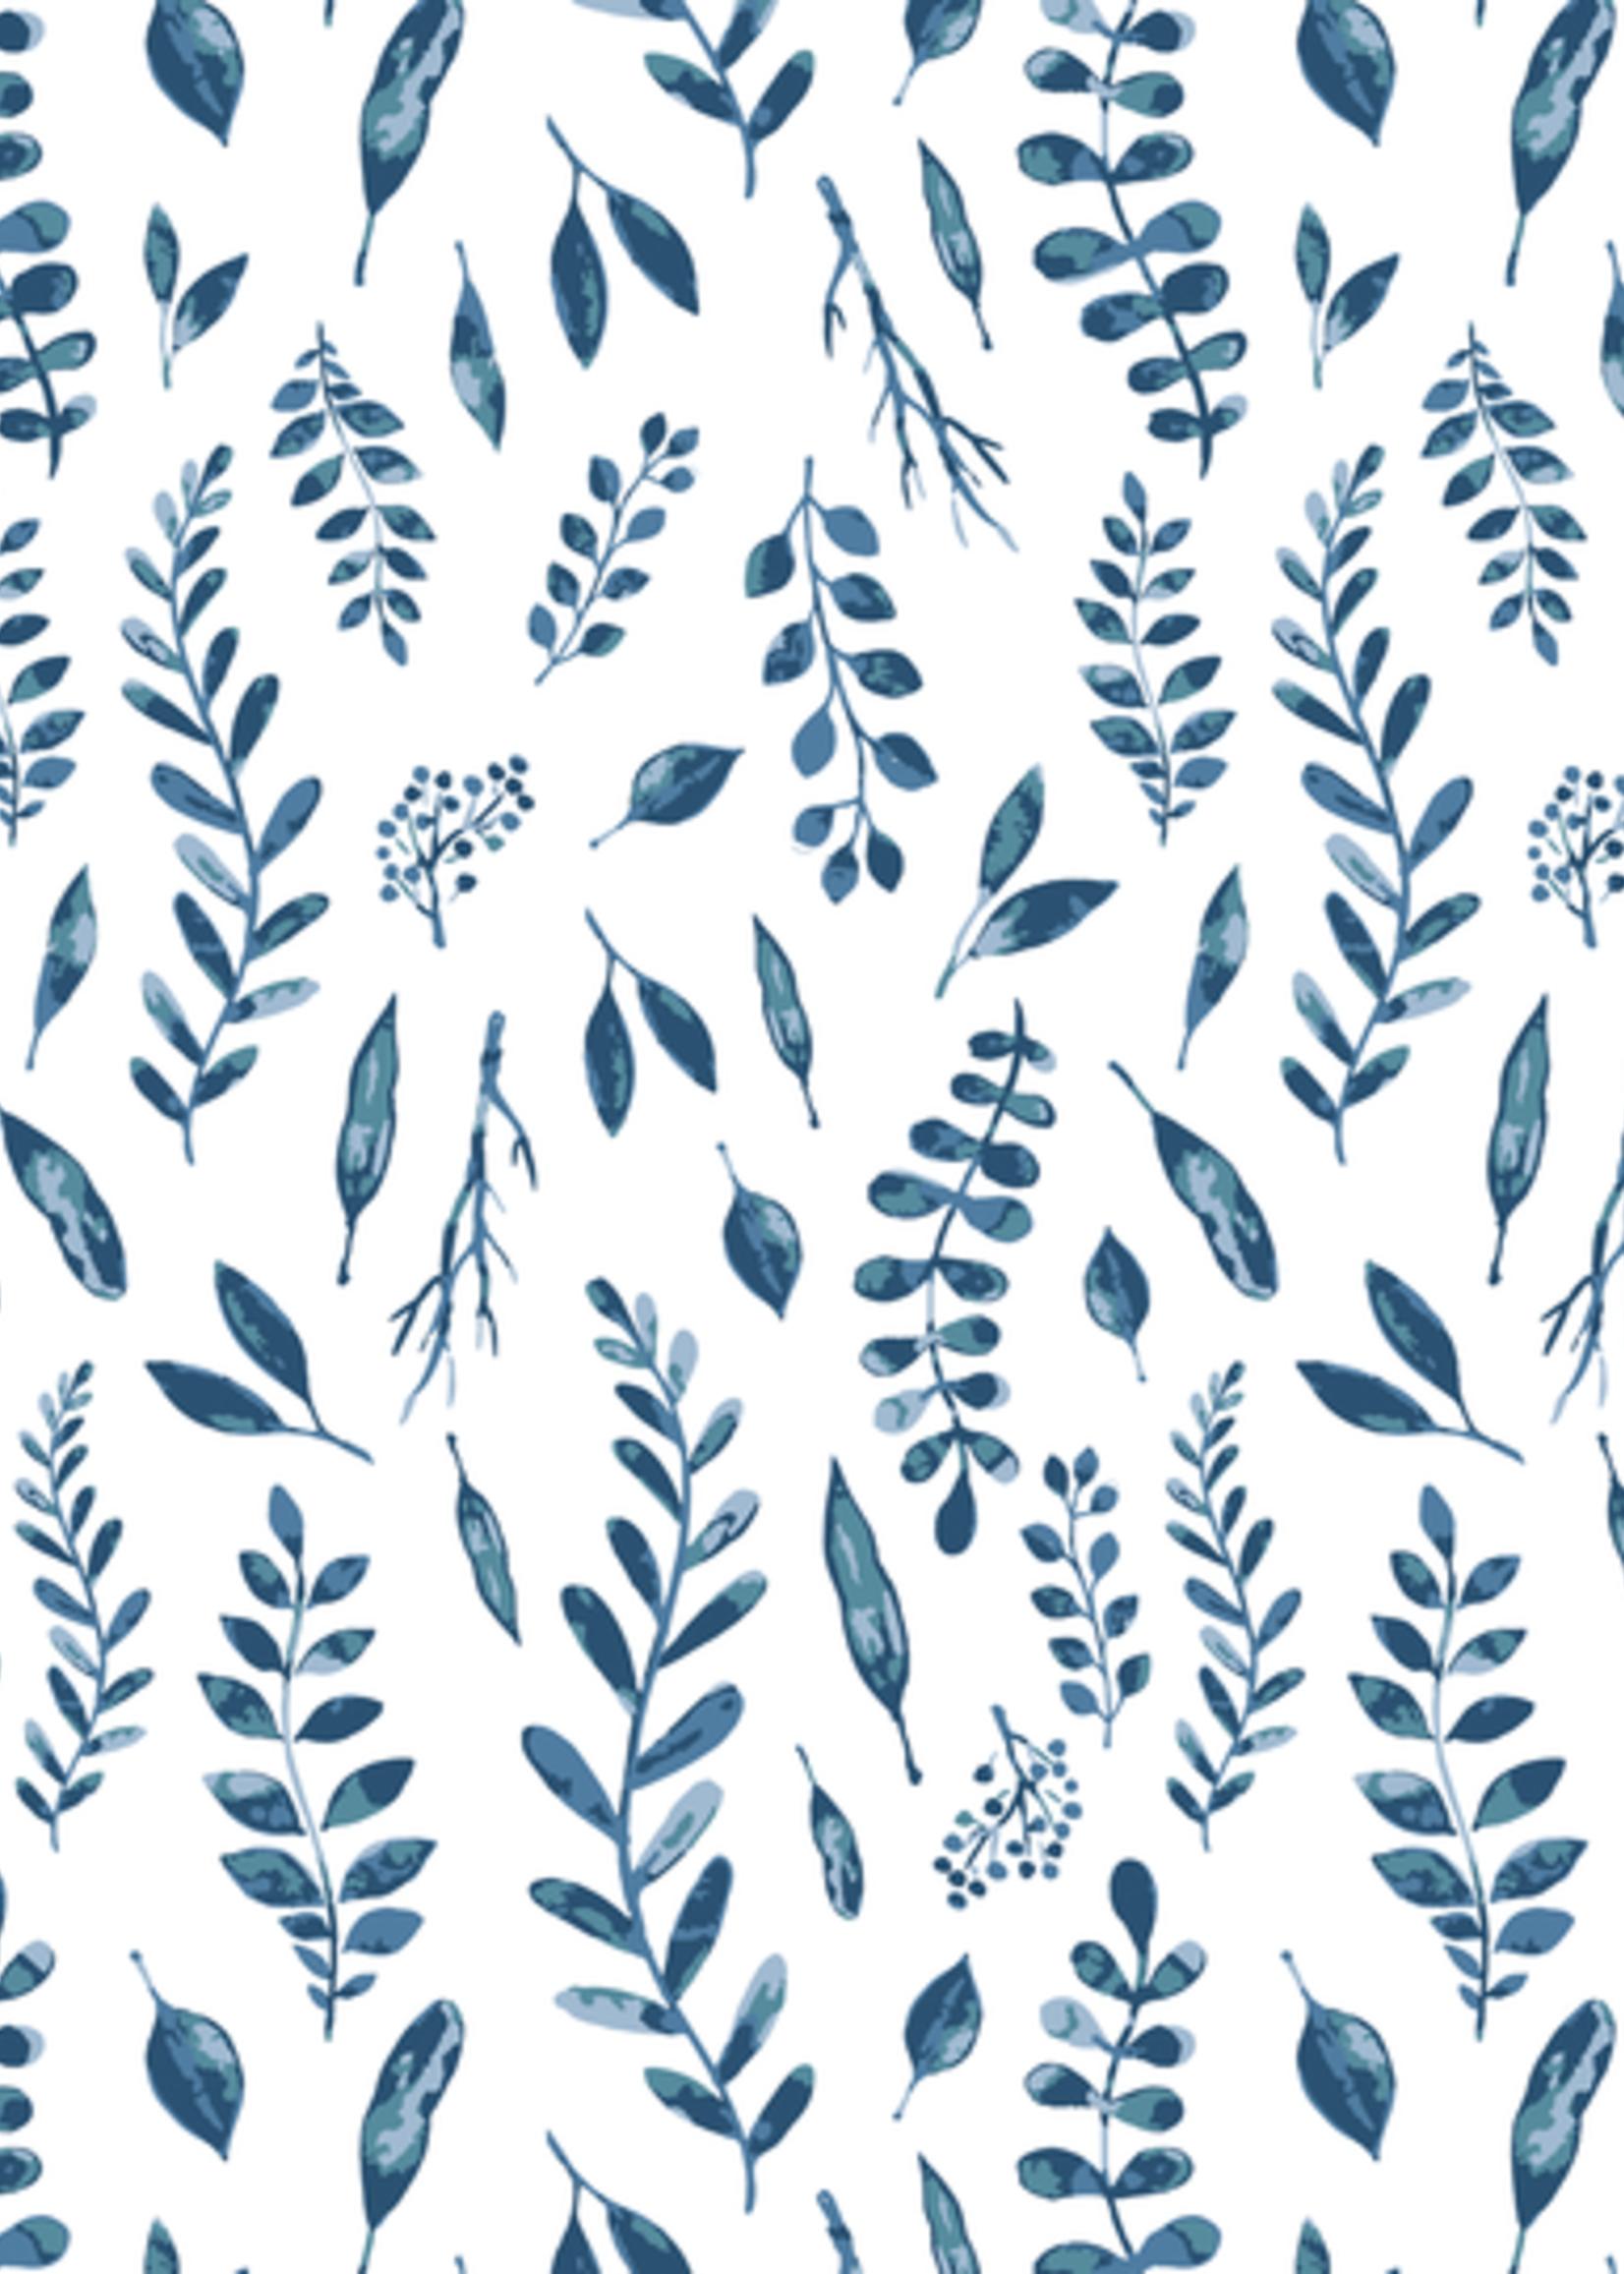 Bebe Au Lait Blue Leaves Classic Muslin Bedtime Sleeper (6-12 Months)